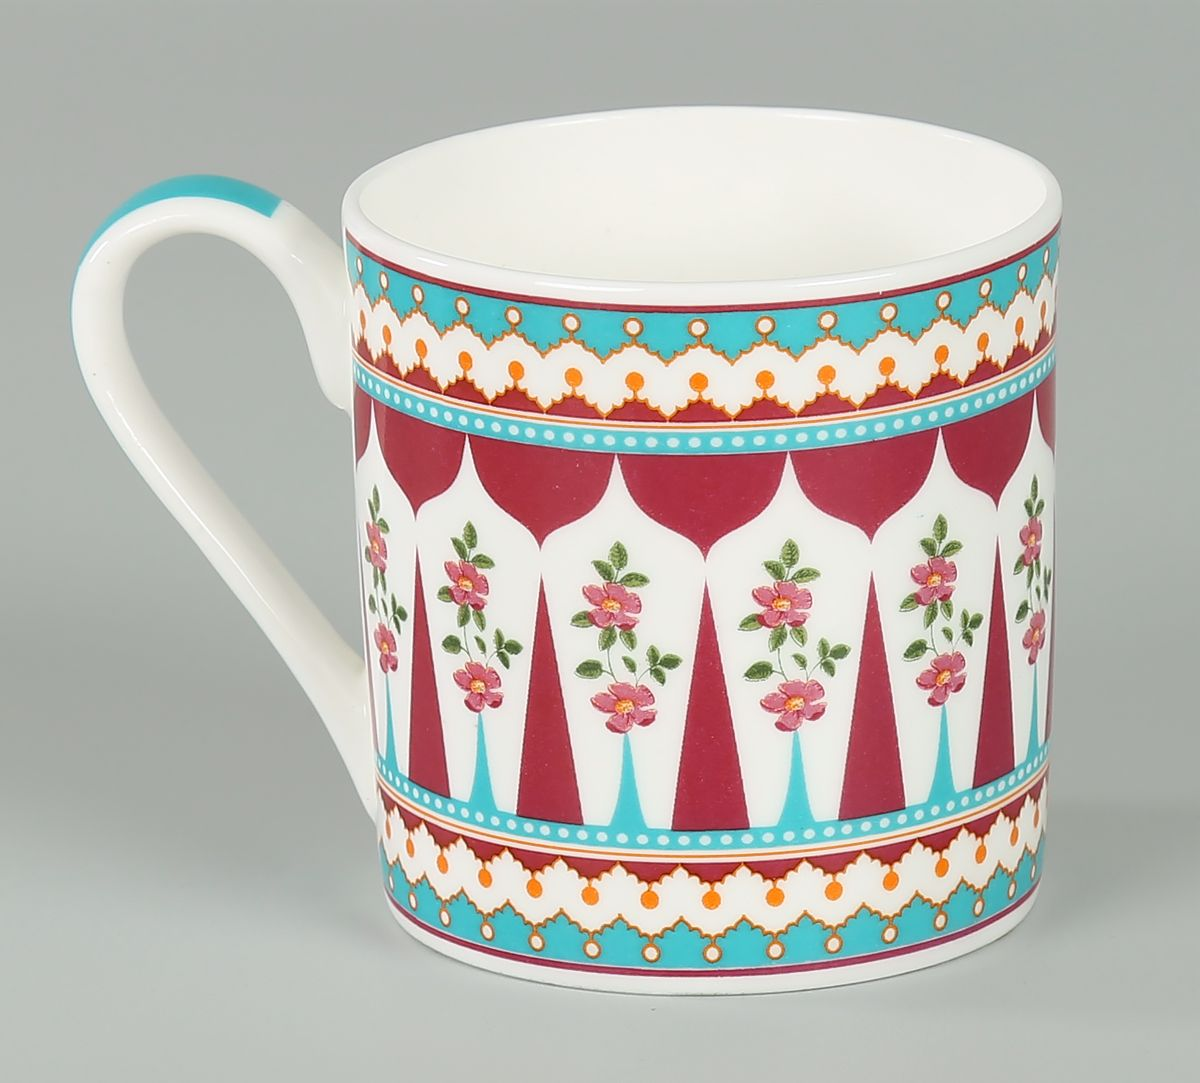 India Circus by Krsnaa Mehta Magenta Quirk Espresso Mug Set of 6